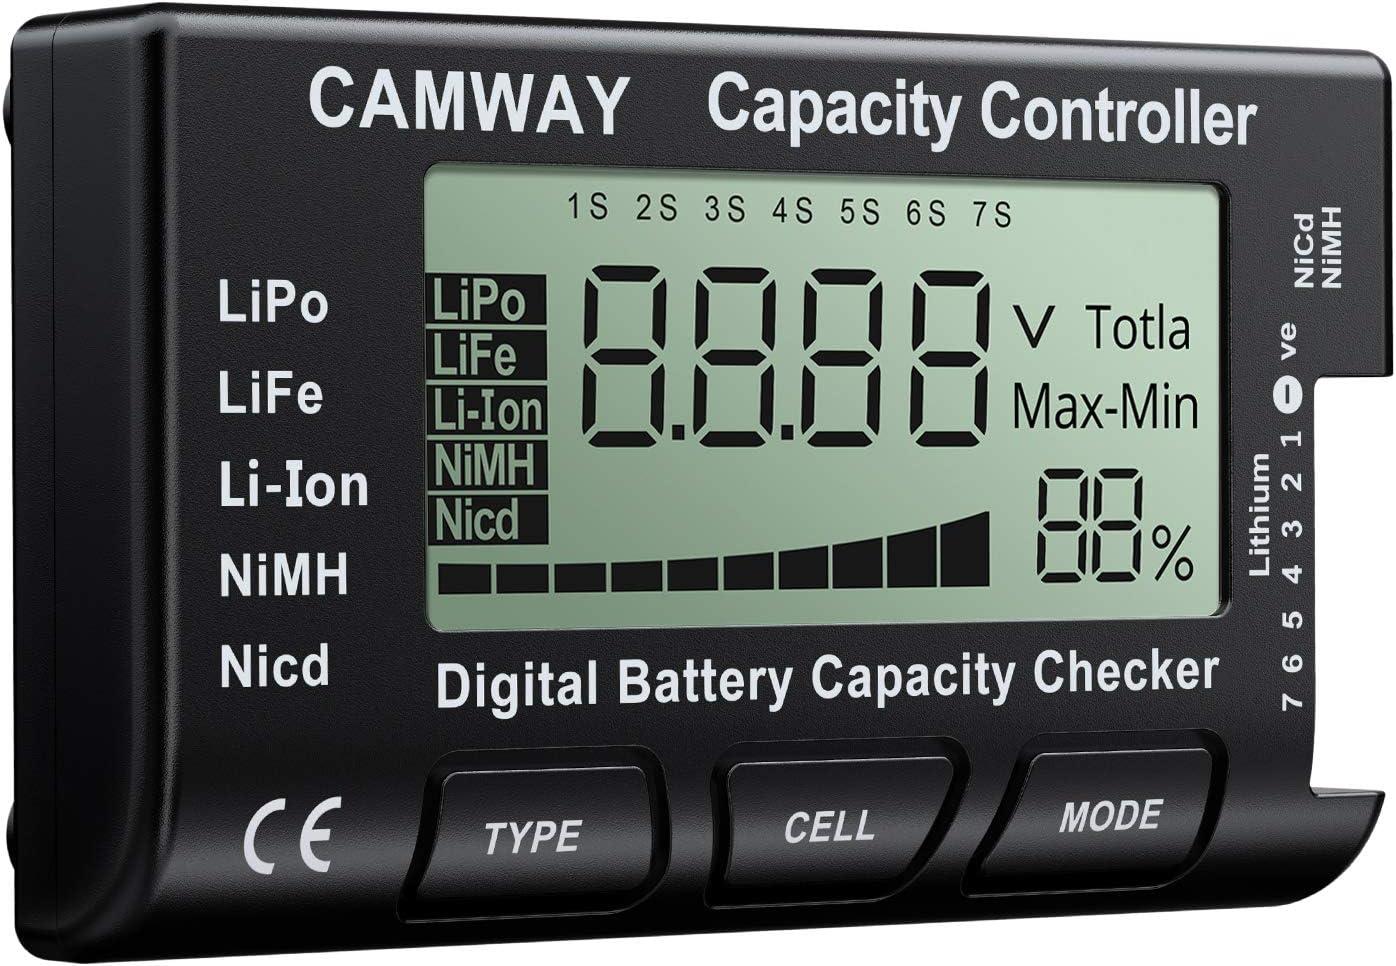 CAMWAY Digital Battery Capacity Tester RC Cellmeter Lipo Battery Tester LCD Battery Checker Controller for LiPo Life Li-ion NiMH Nicd LiFePO4